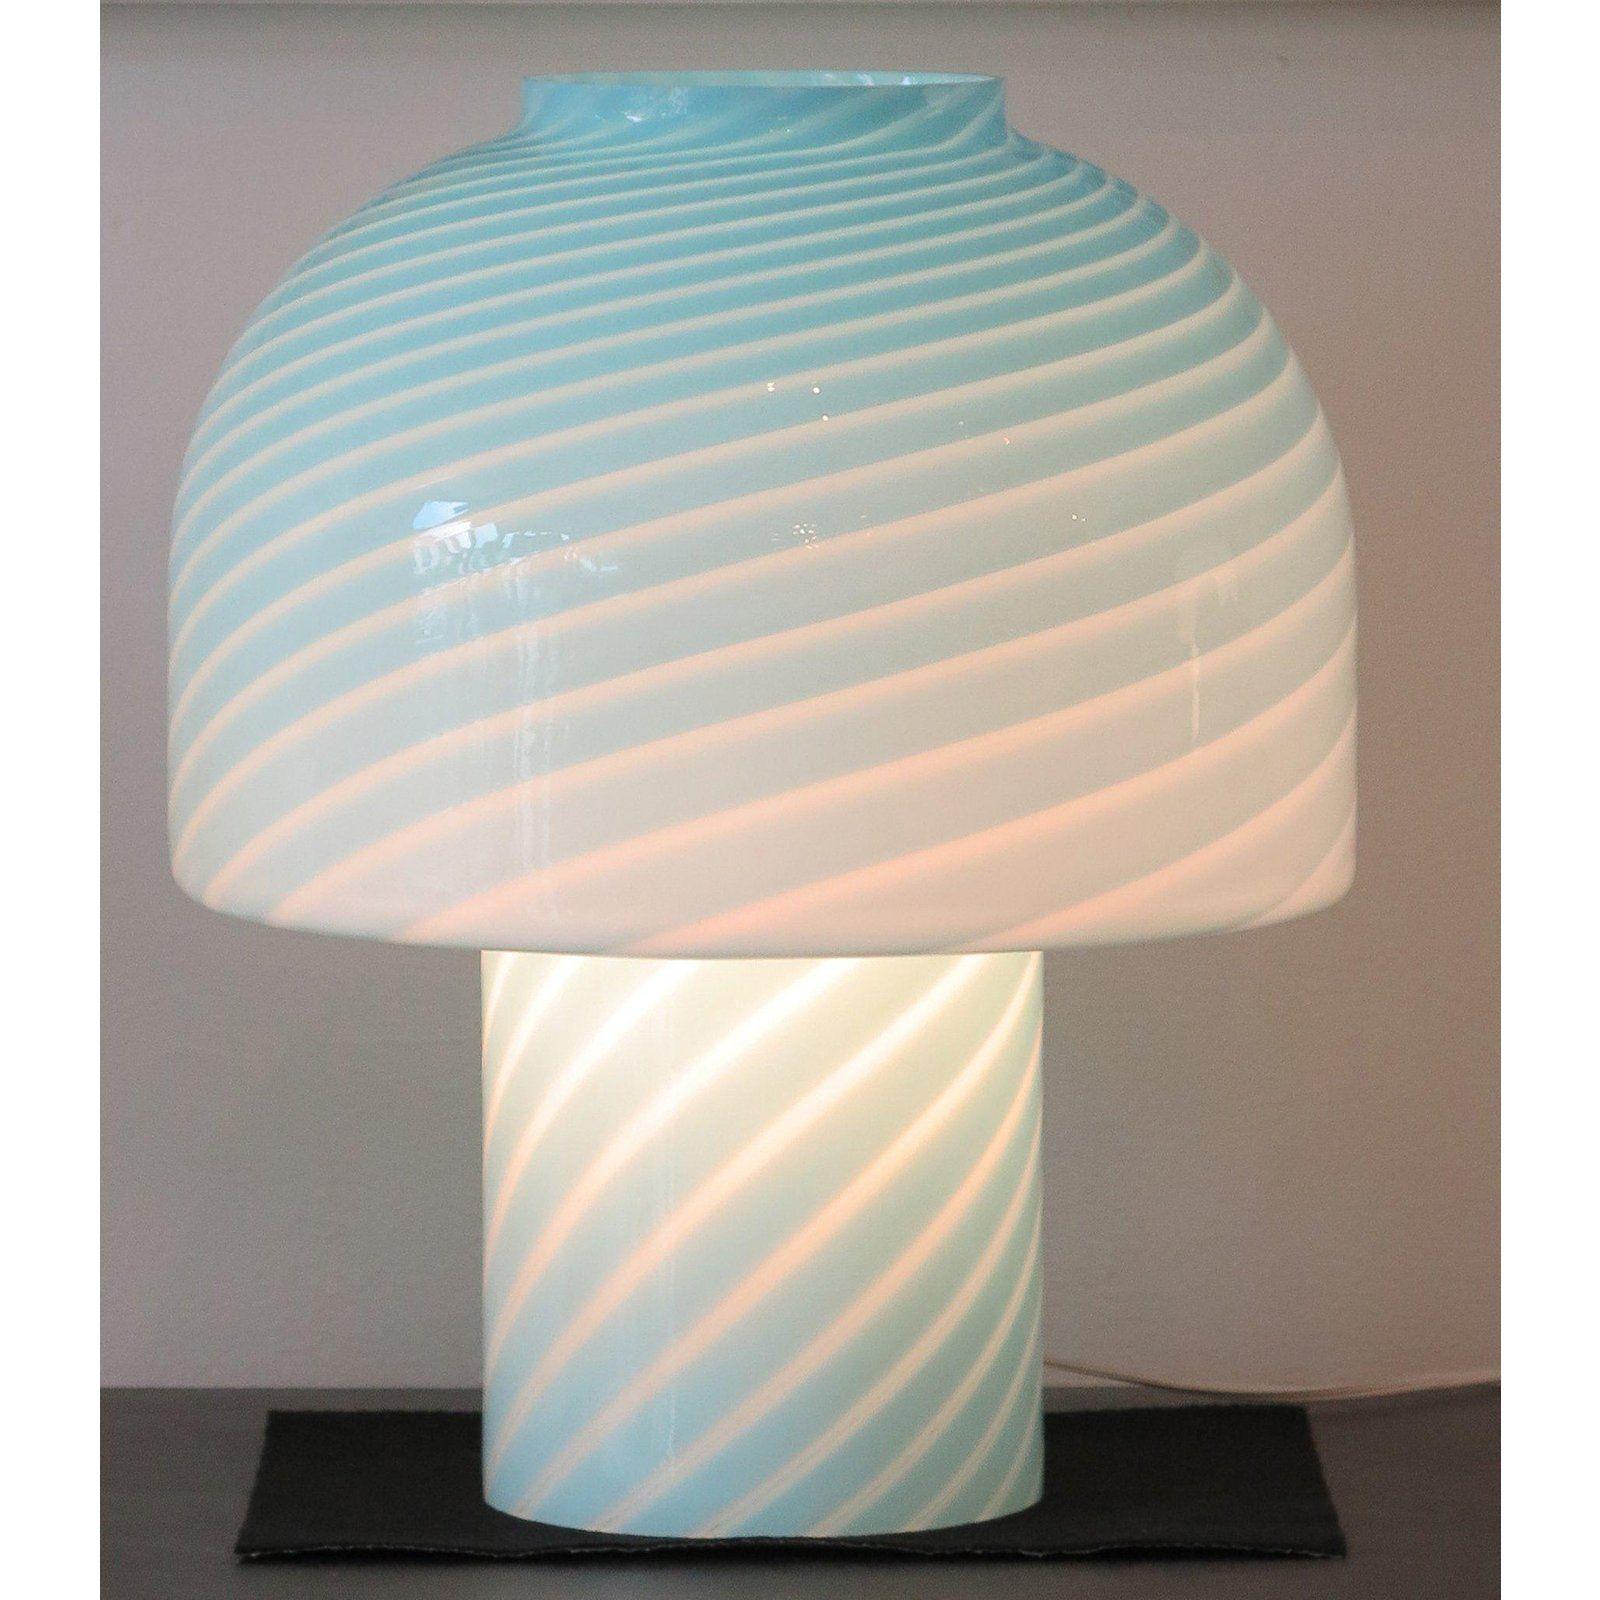 1980s Vintage Vetri Murano Glass Blue Swirl Table Lamps A Pair Table Lamp Lamp Murano Lamp